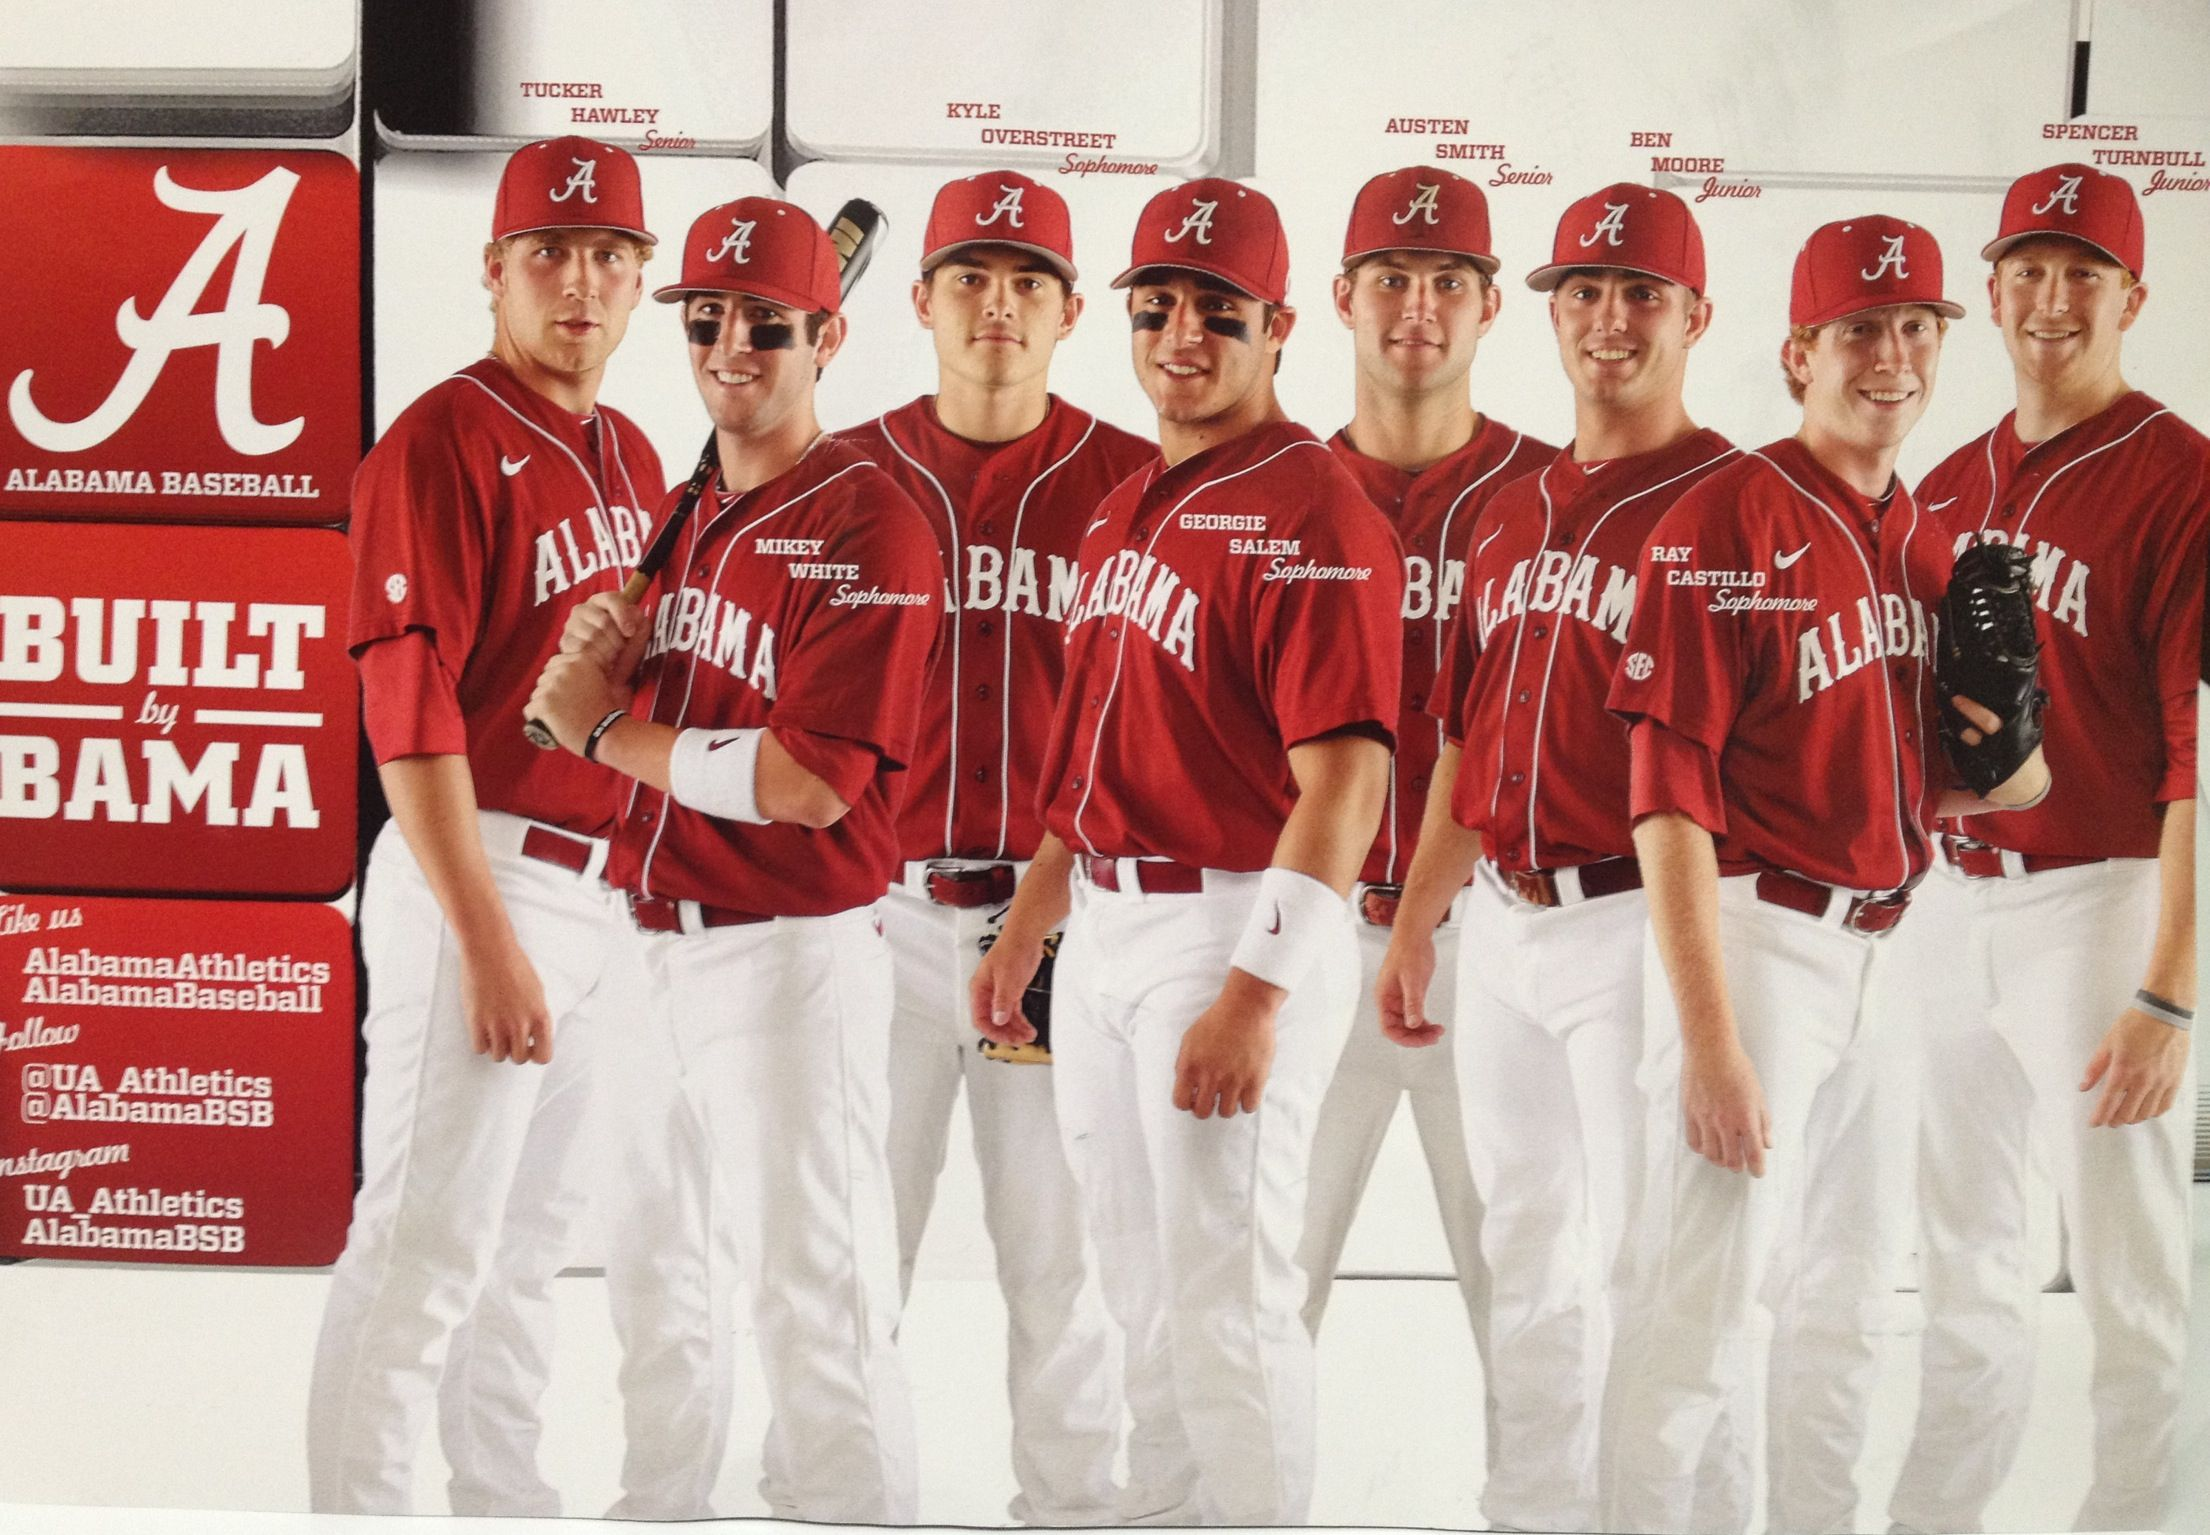 Team Poster 2014 Alabama University Of Alabama The University Of Alabama